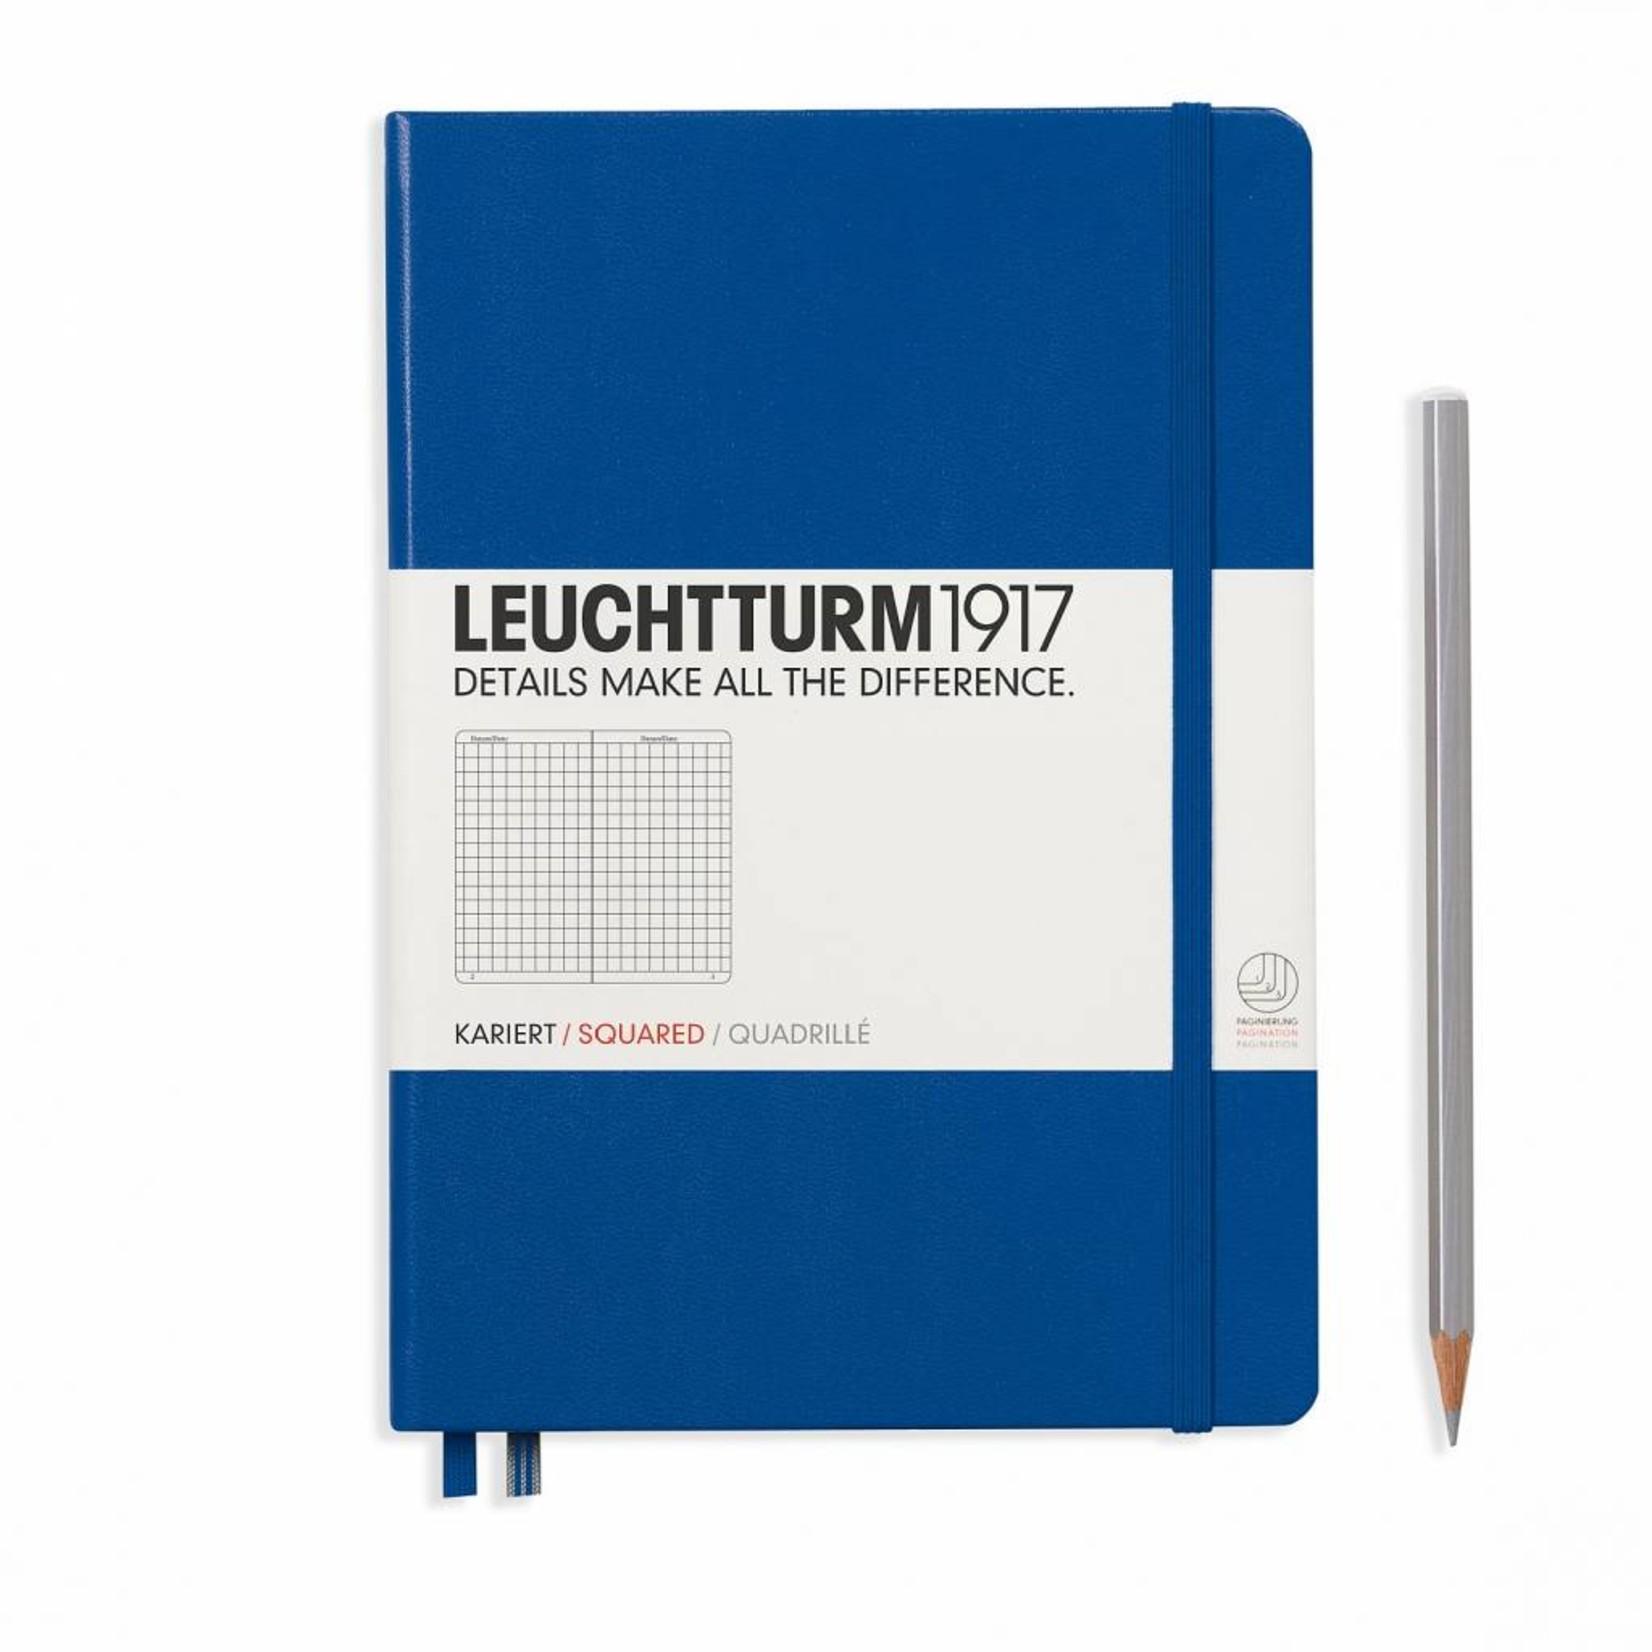 Leuchtturm1917 Leuchtturm1917 Notizbuch, Medium, Königsblau, Kariert